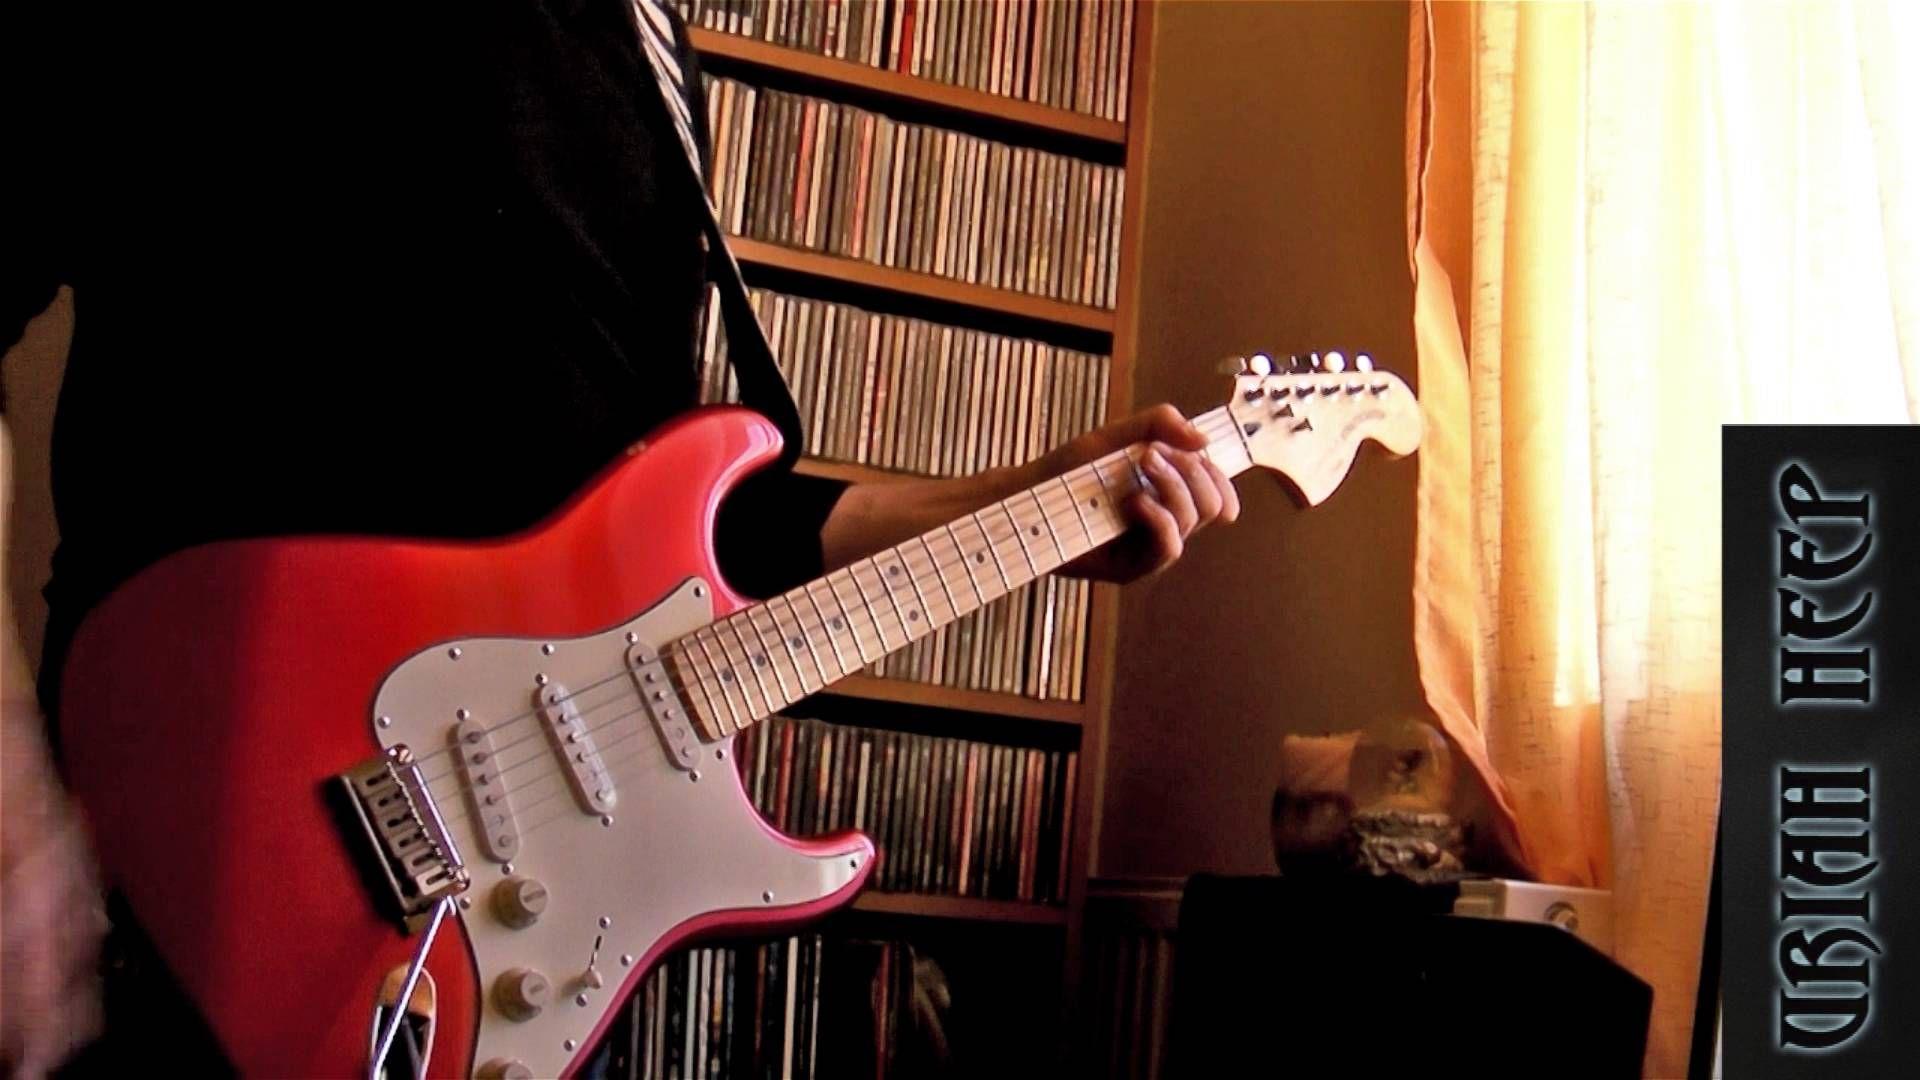 URIAH HEEP - Easy livin' (guitar cover)